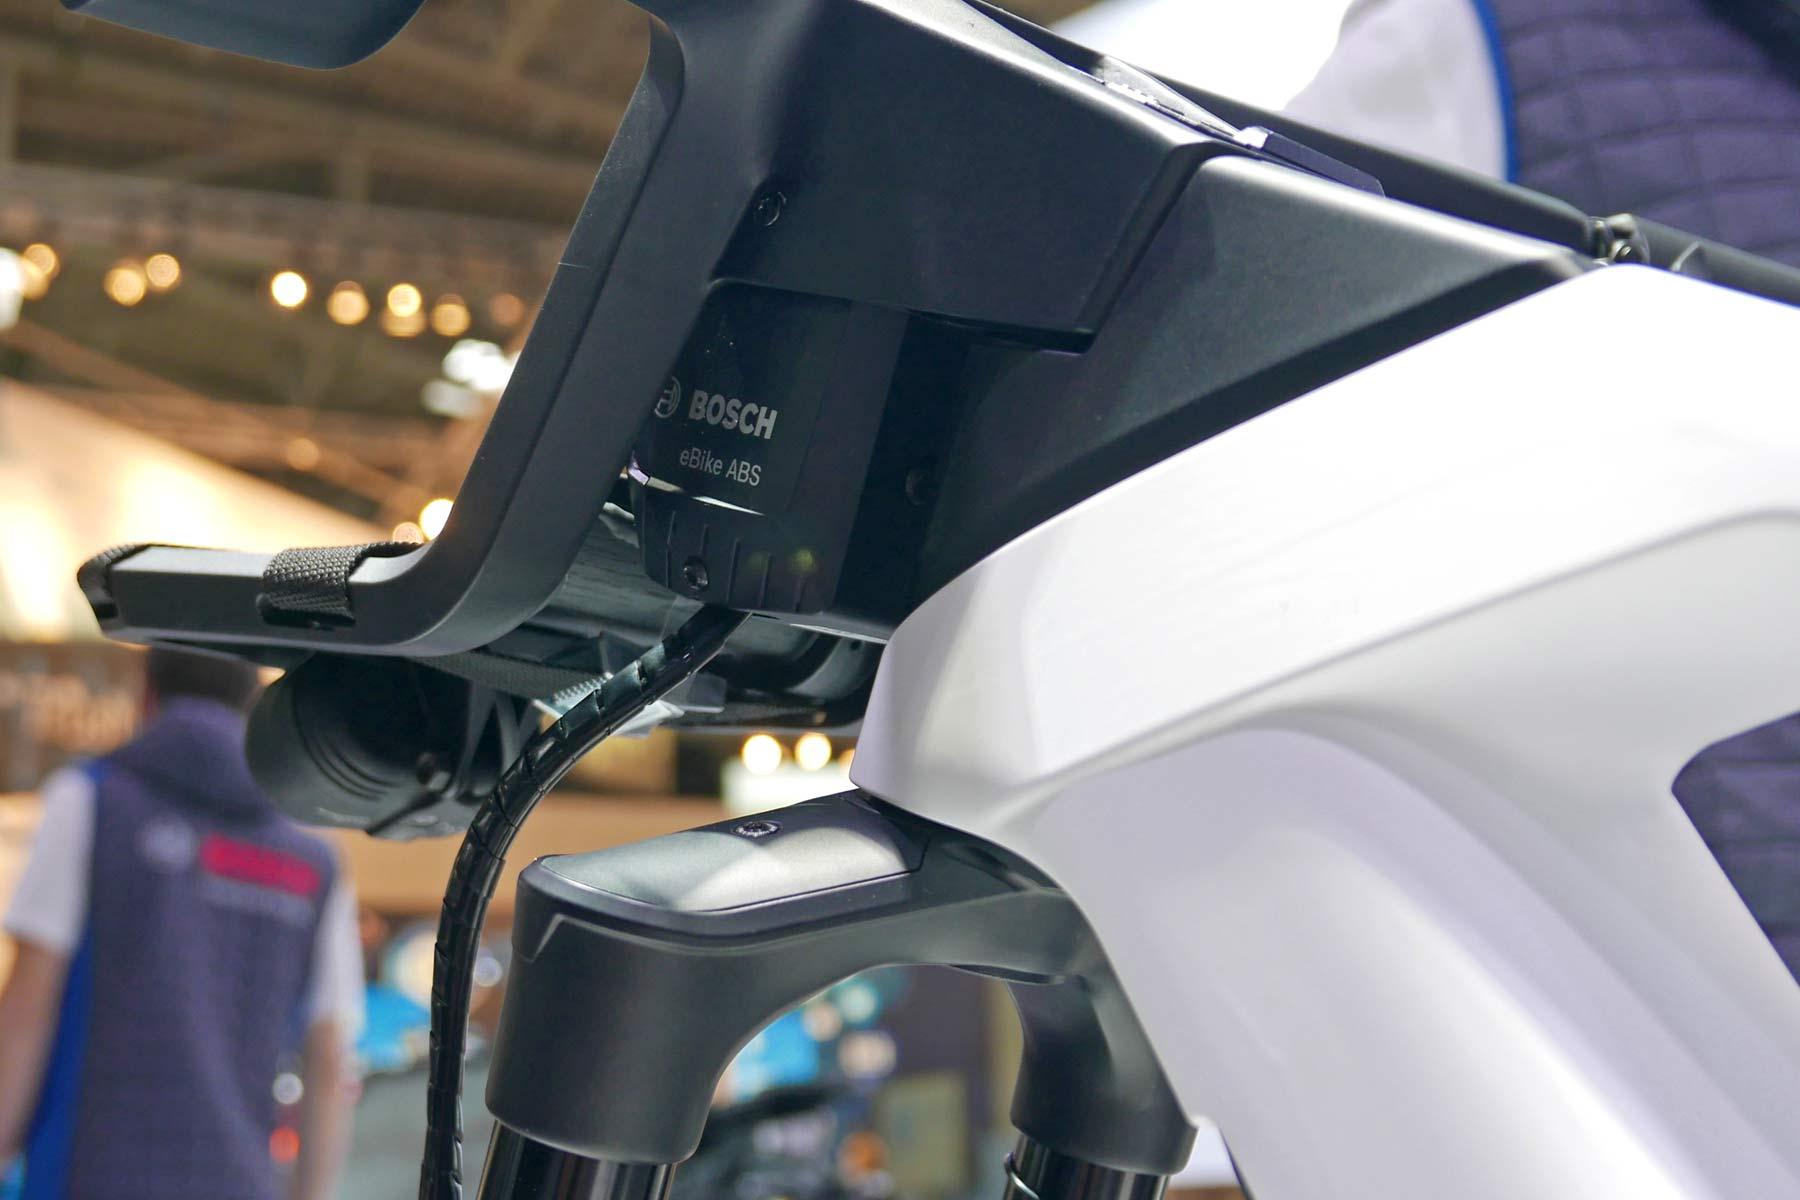 Bosch eBike ABS prototype e-bike with integrated anti-lock braking, on-board computer controller